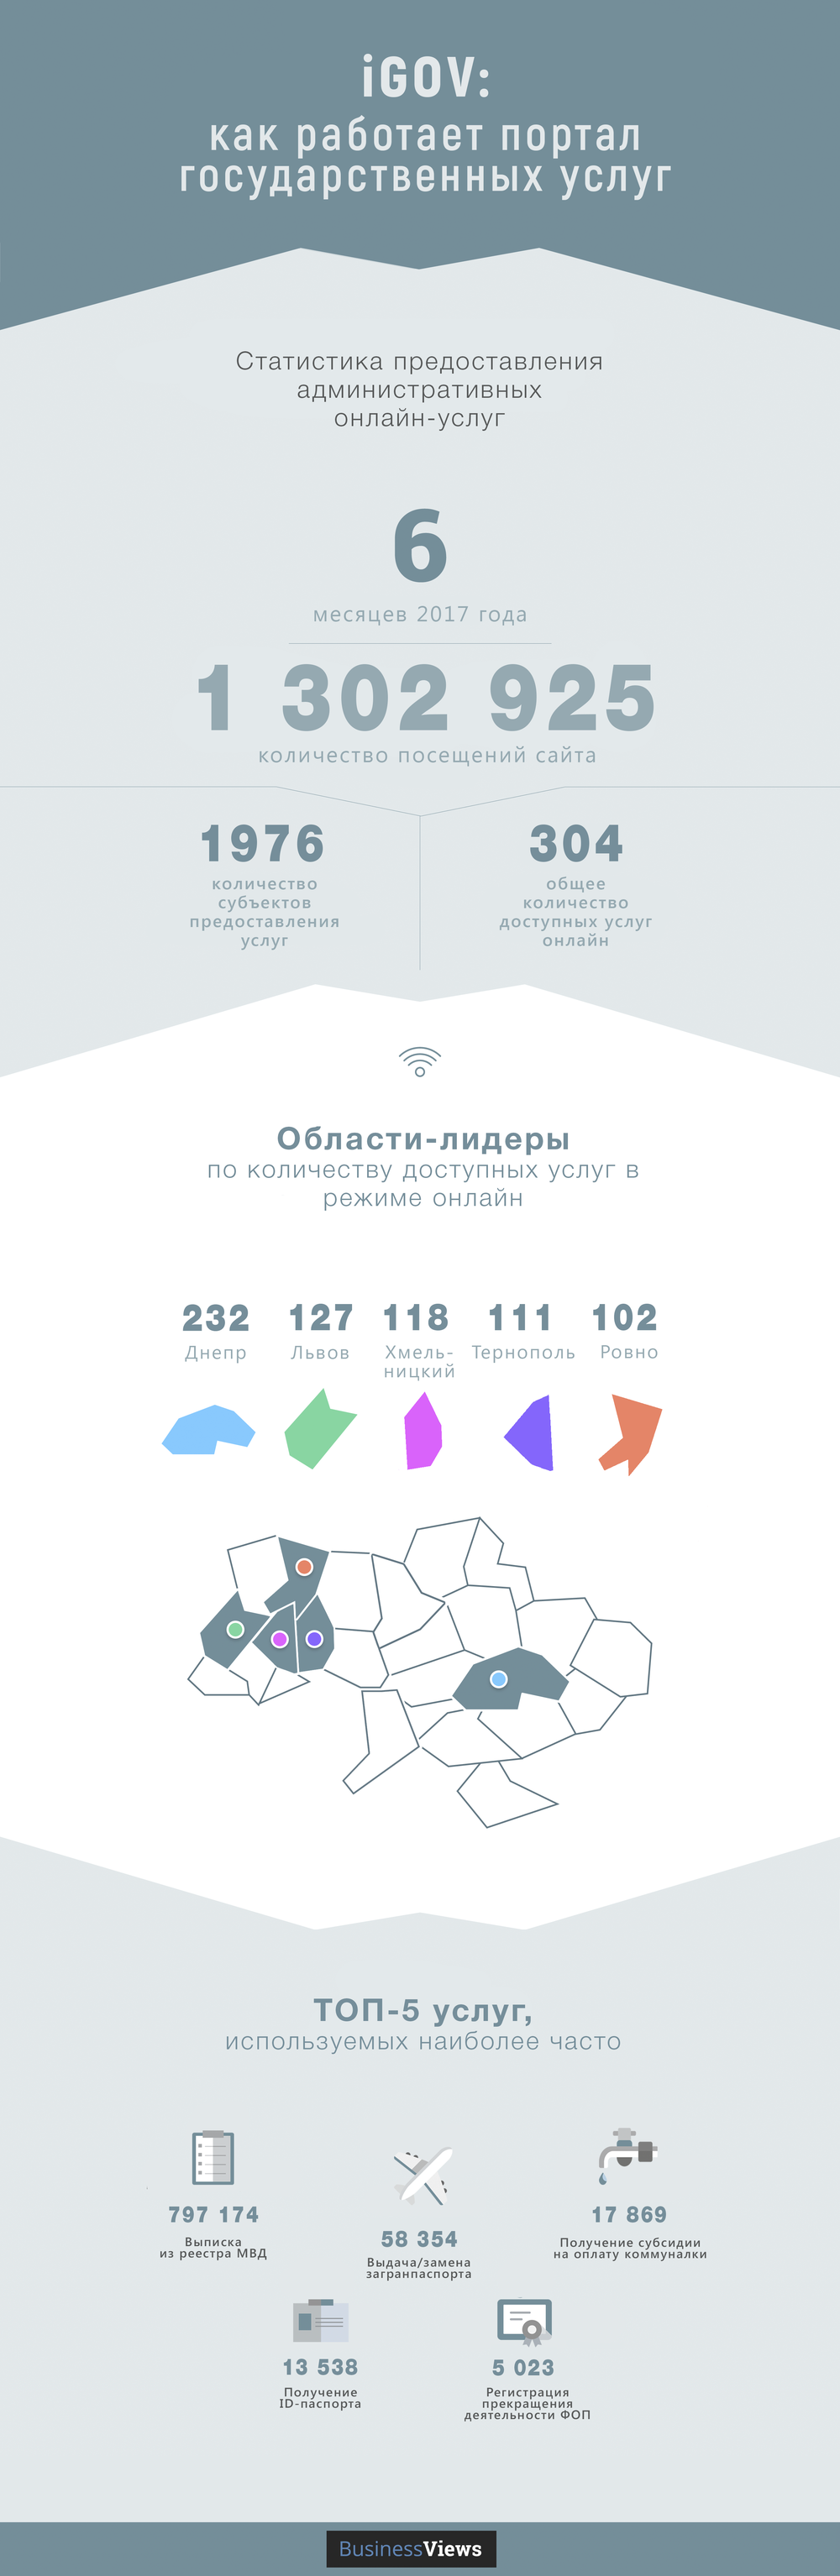 iGov infographics